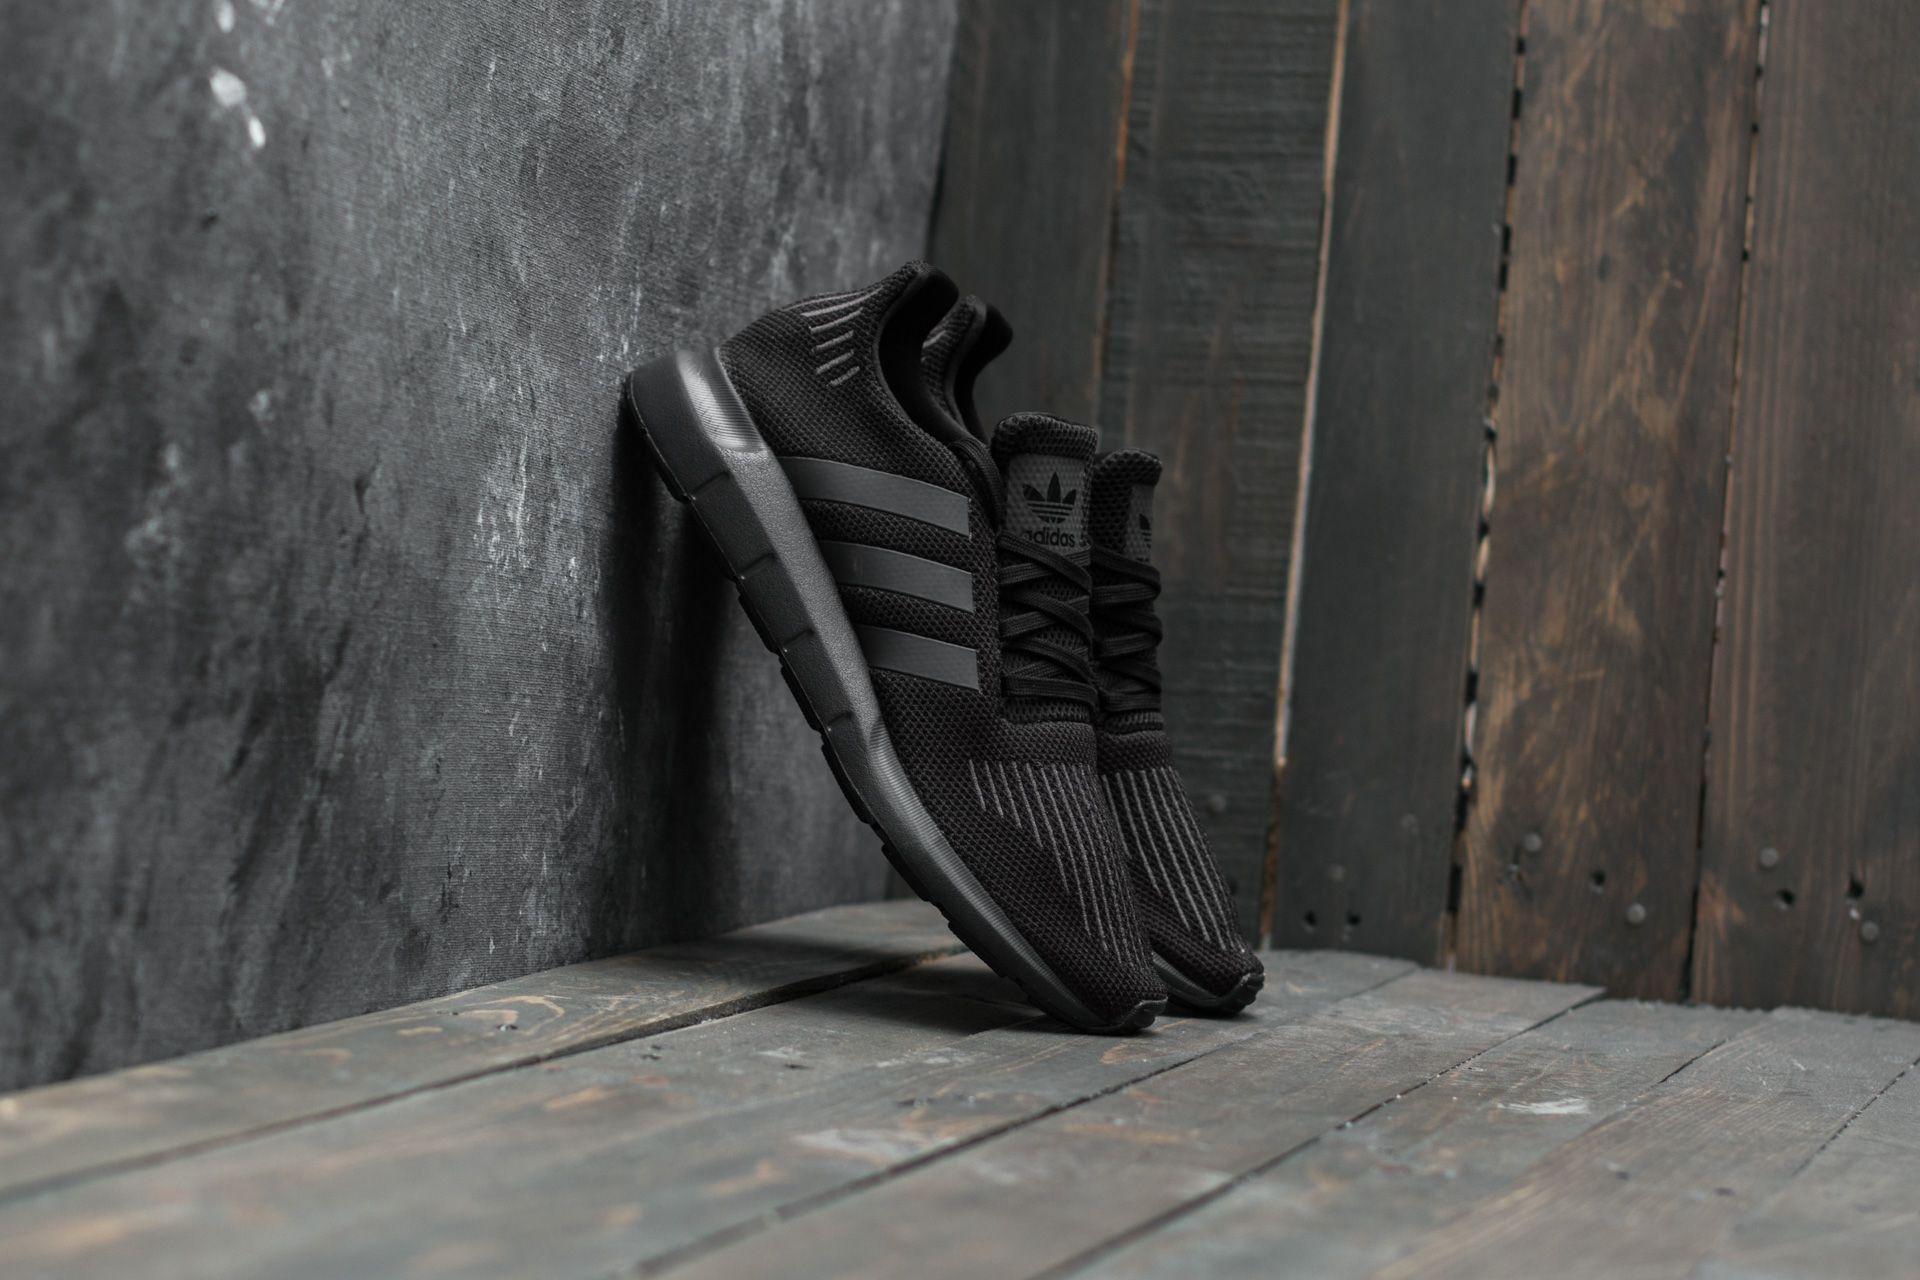 e2ef75c984f49 adidas Swift Run Core Black/ Utility Black/ Core Black | Footshop